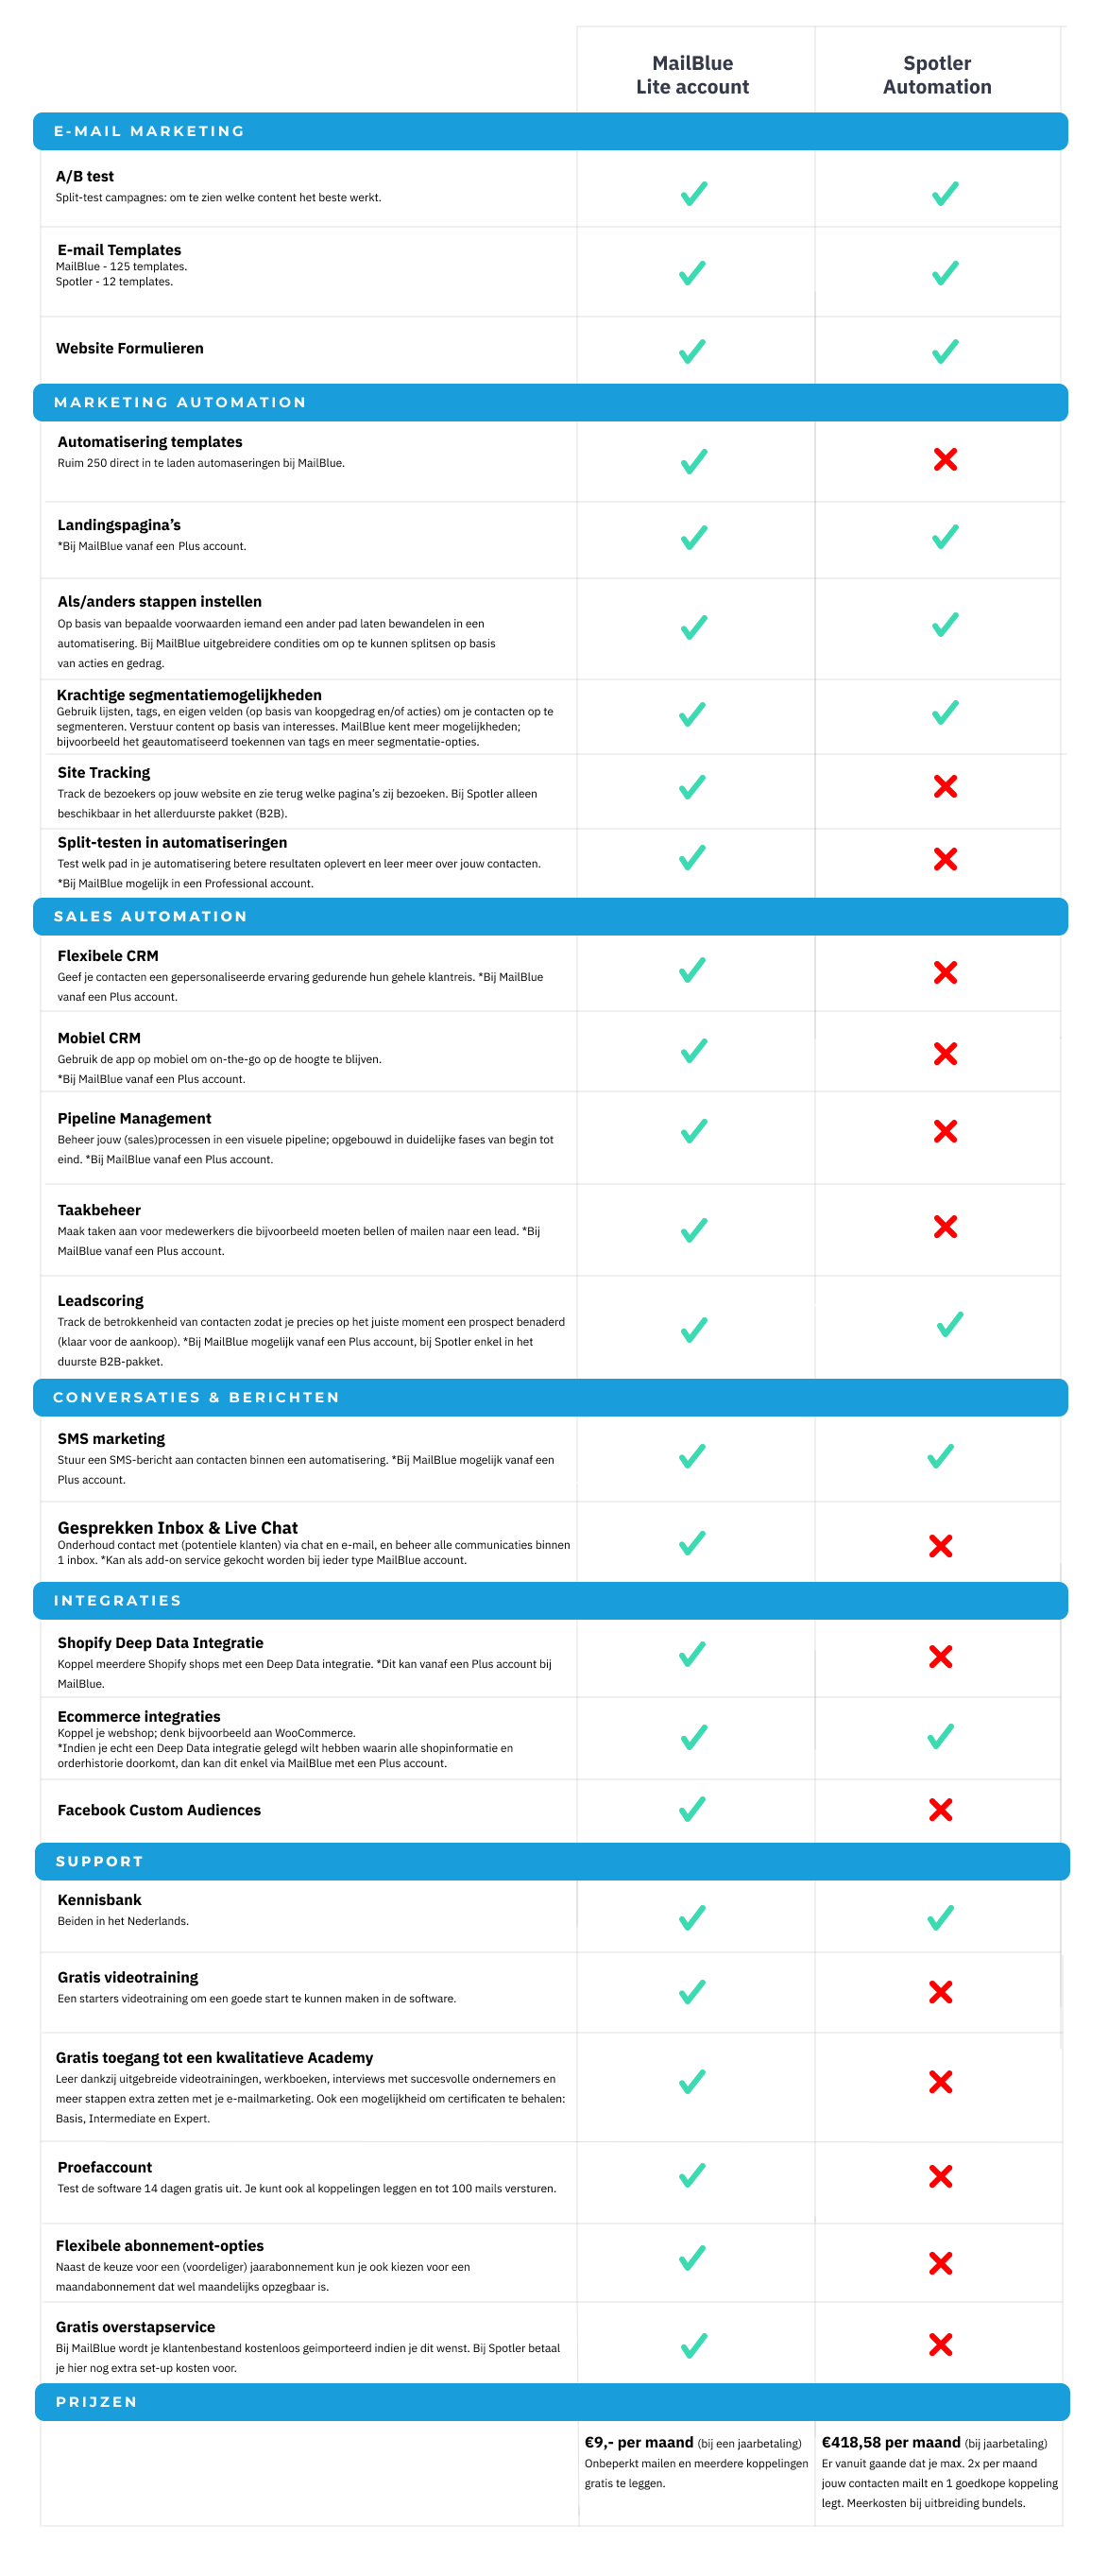 mailblue-vs-spotler